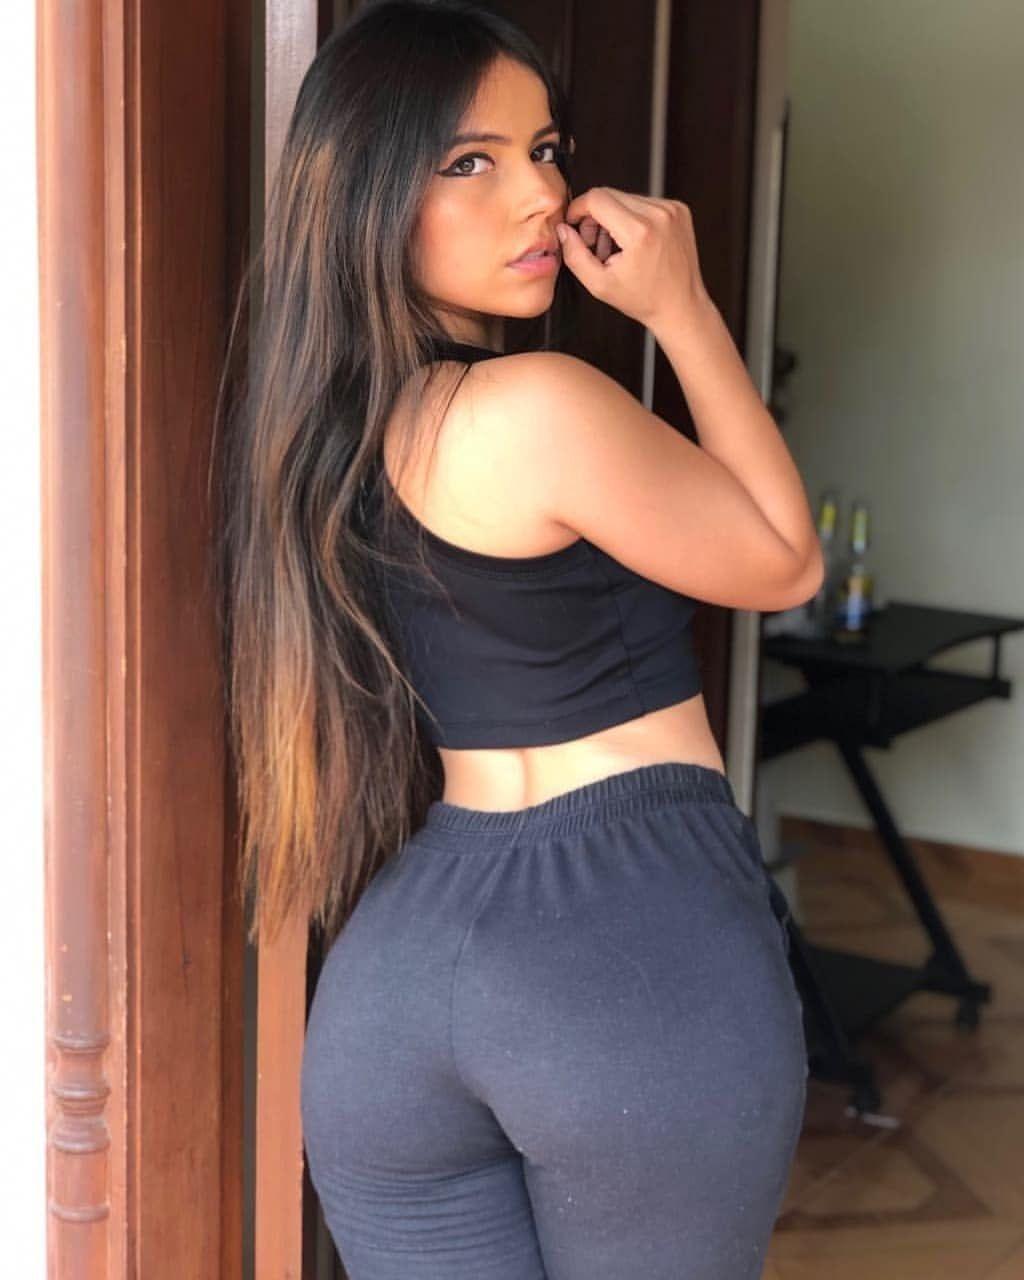 Pack Aida Cortéz [VIDEO Y FOTOS] 2